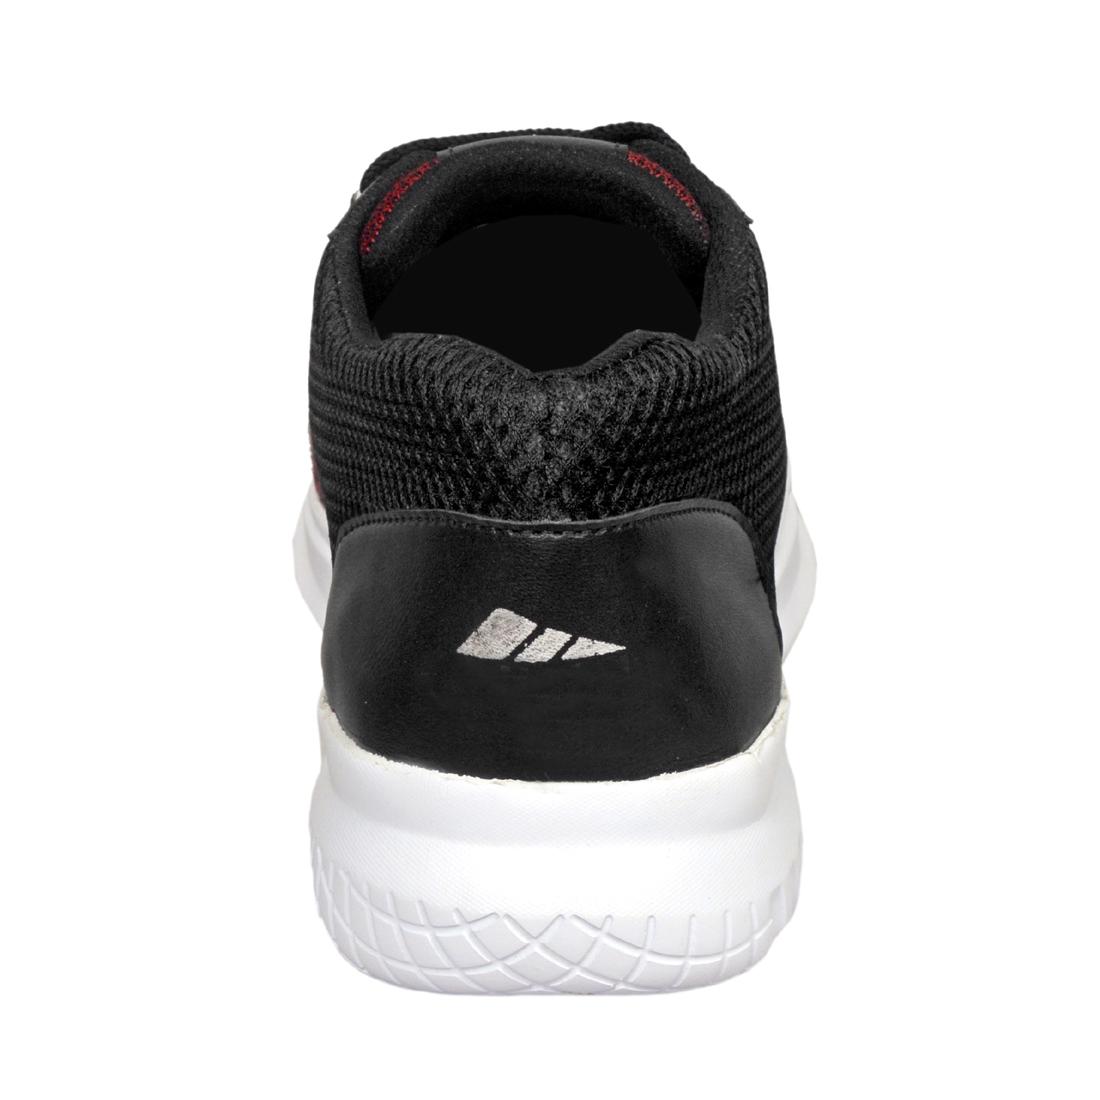 Biggfoot shoes-074